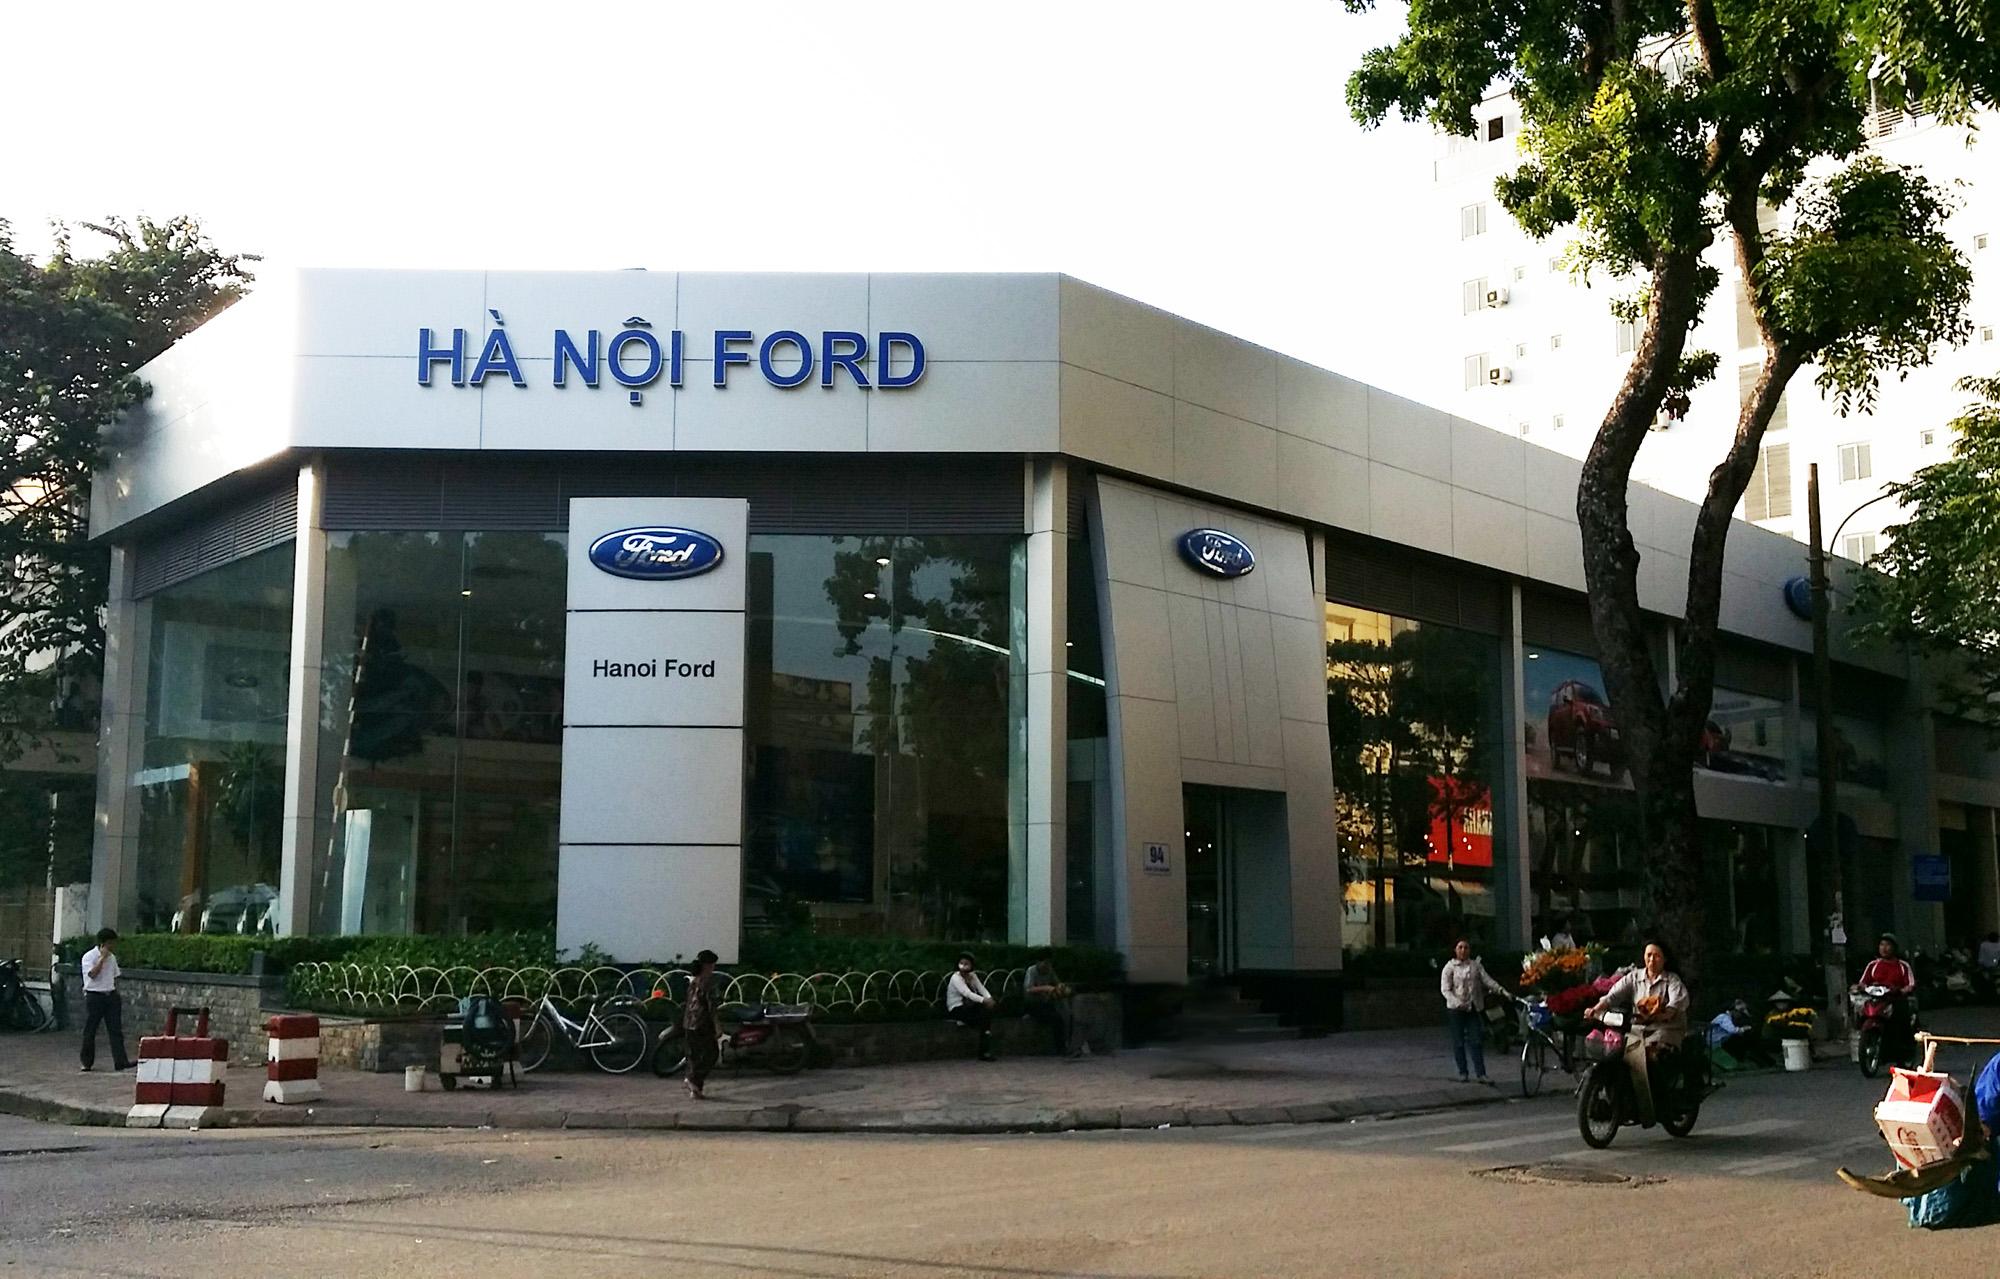 Hà Nội Ford